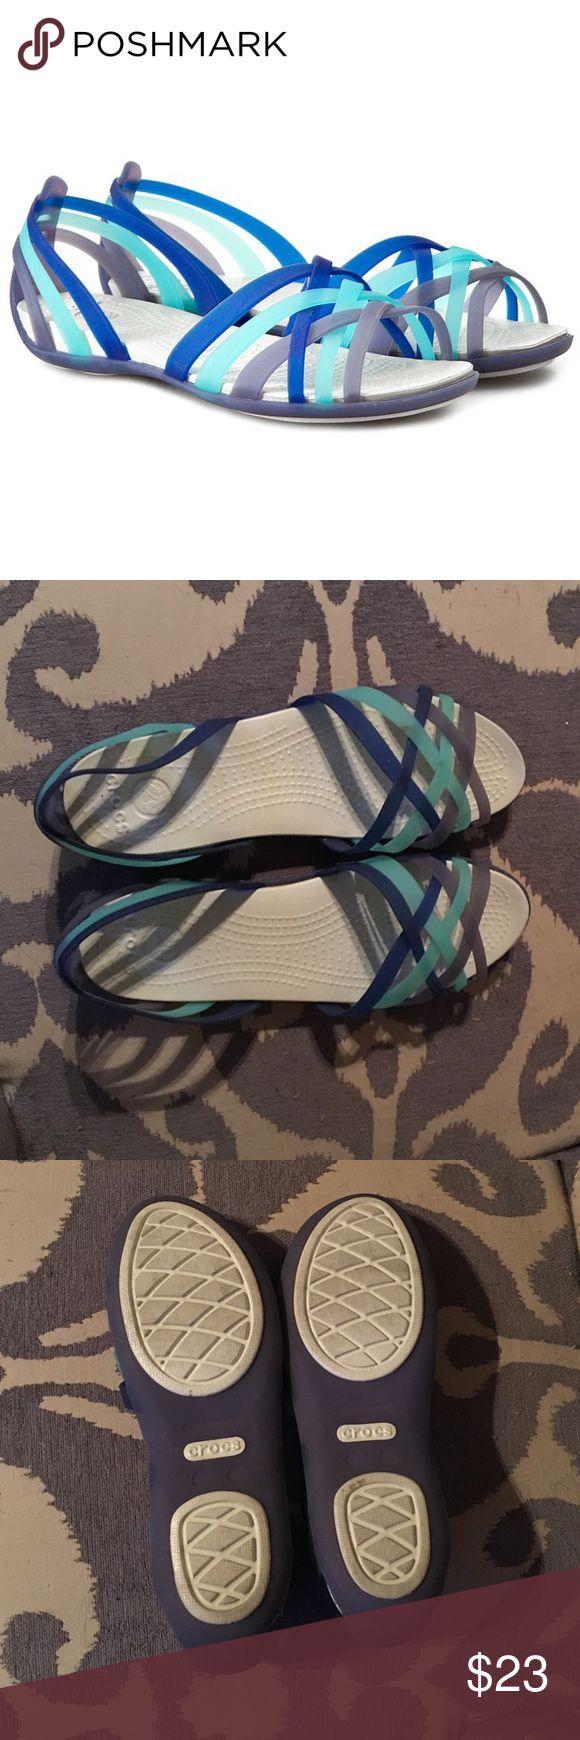 CROCS Huarache Flat Women in Niebieski NWOT Flat Nautical Navy/Aqua Sandaly CROC.  I think I wore them around the house. CROCS Shoes Sandals